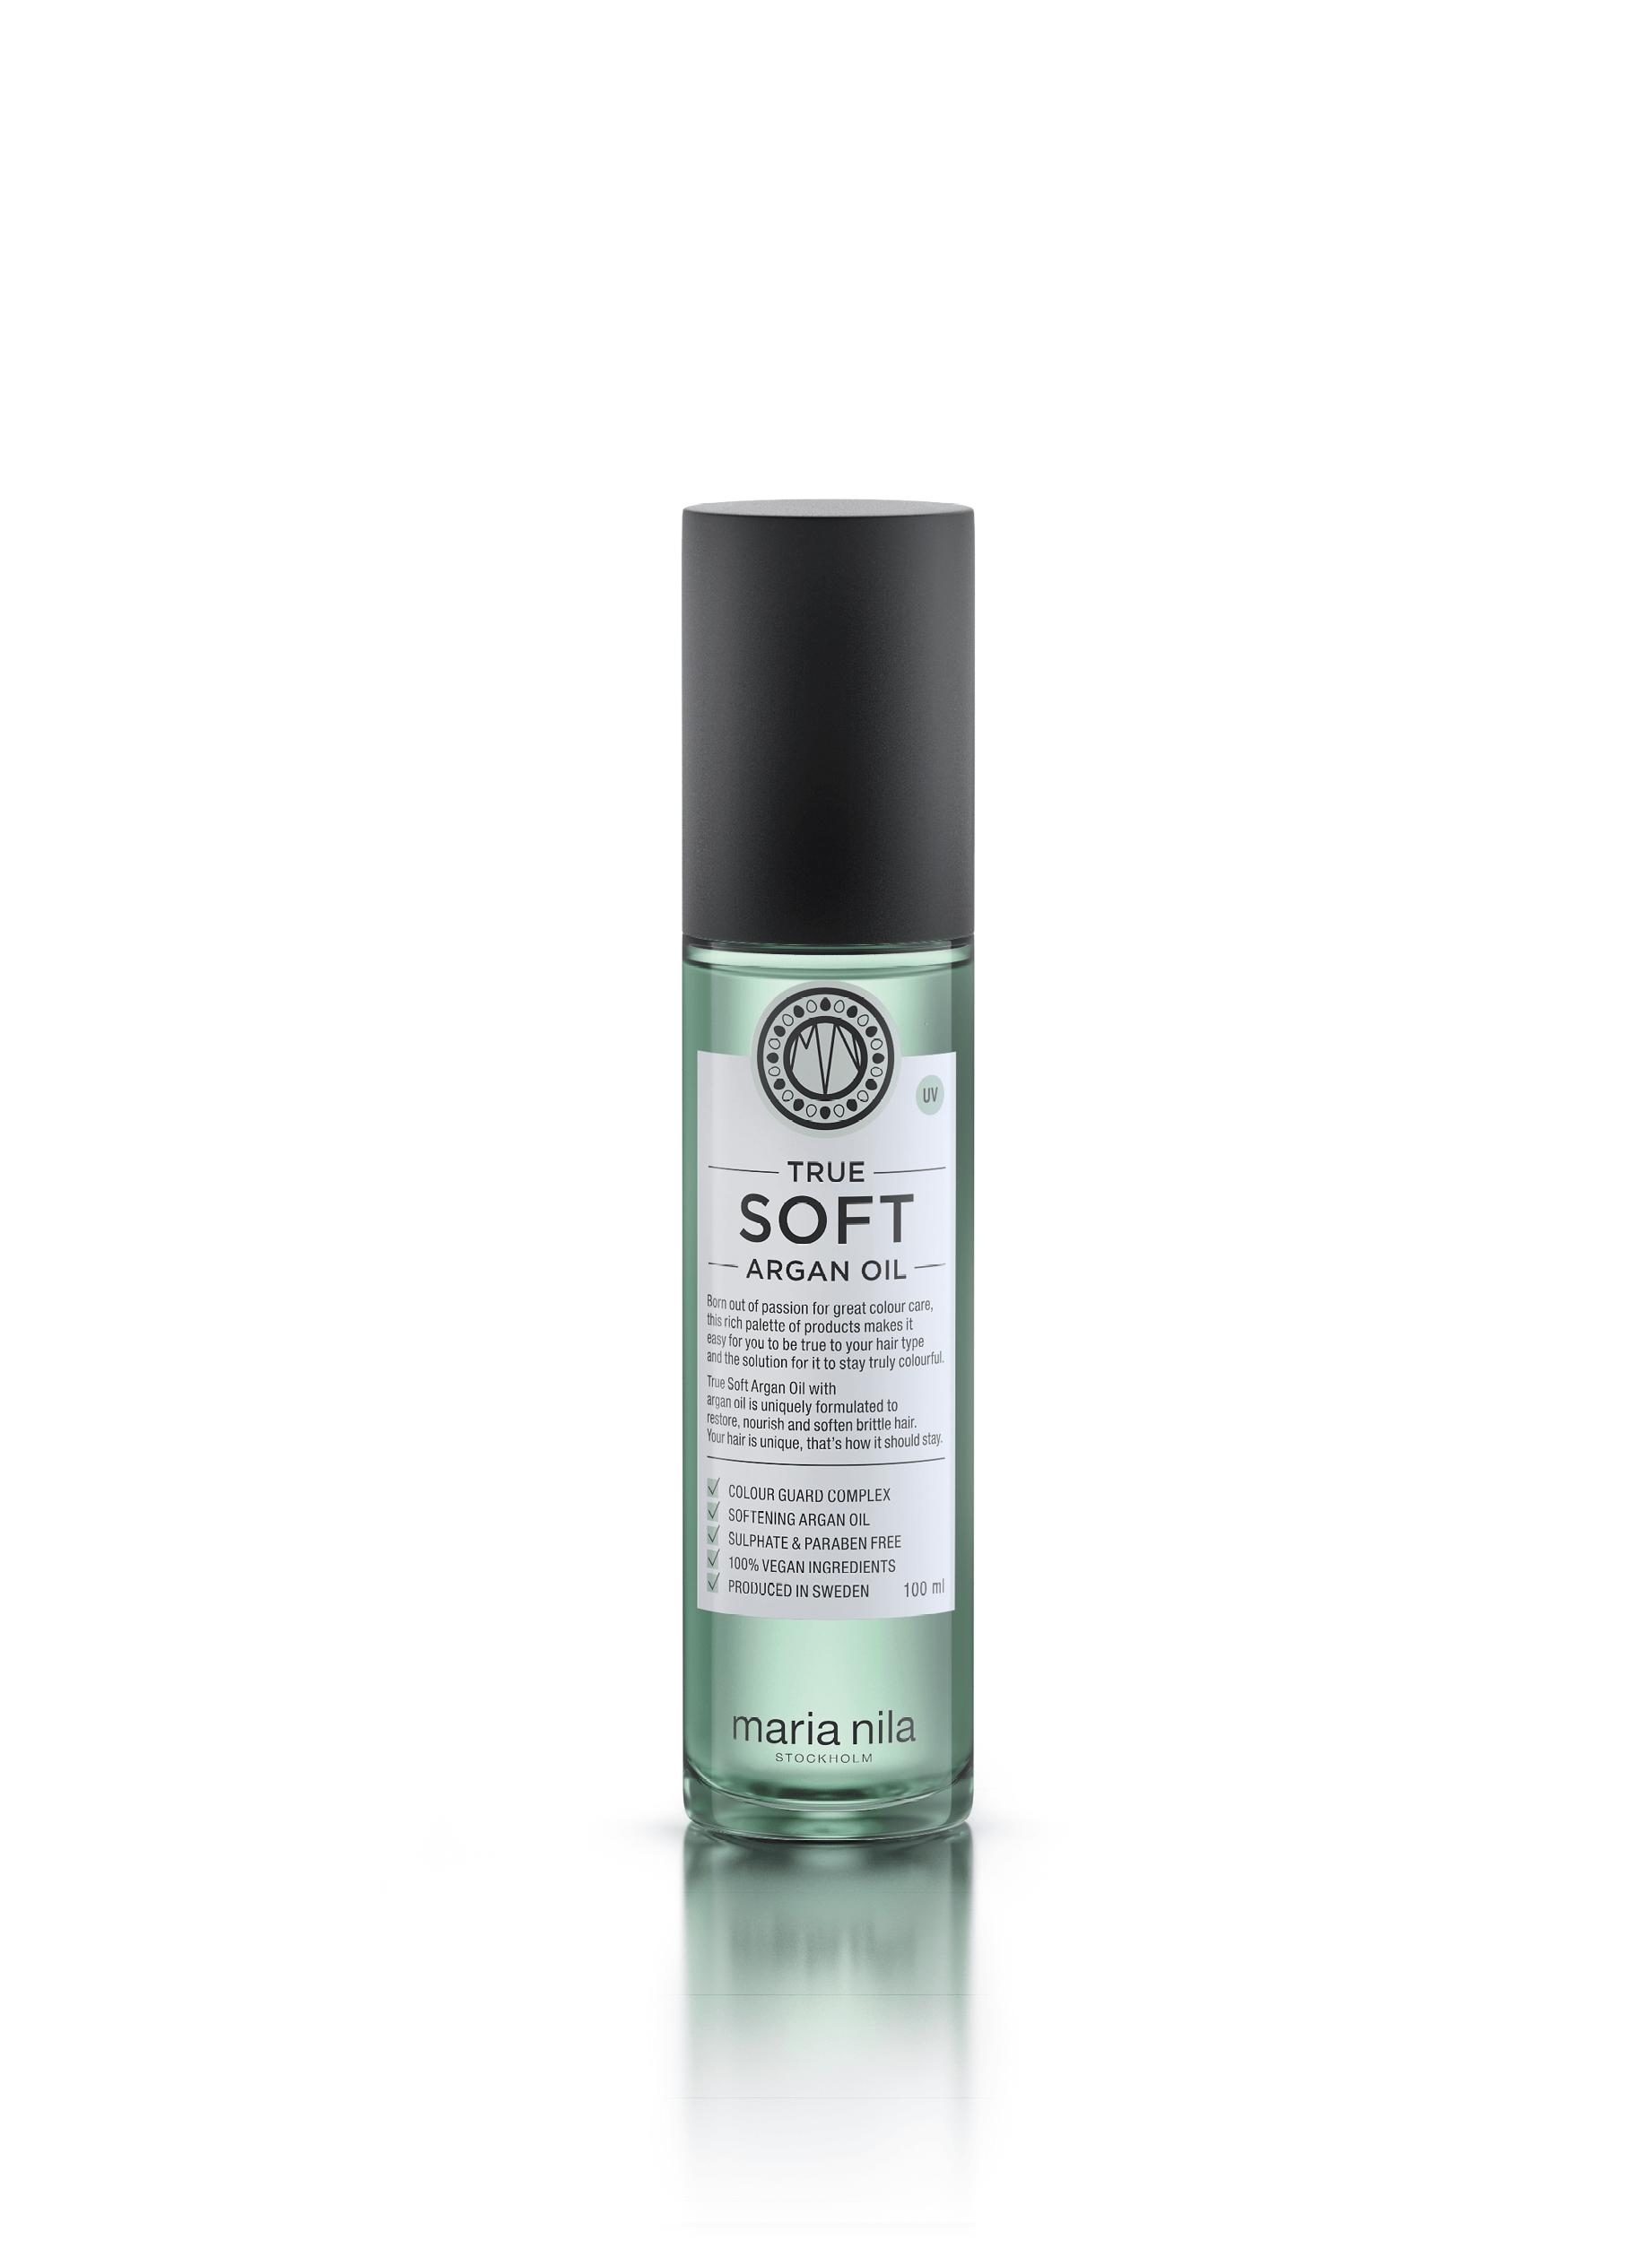 Maria Nila True Soft Argan Oil, 100 ml